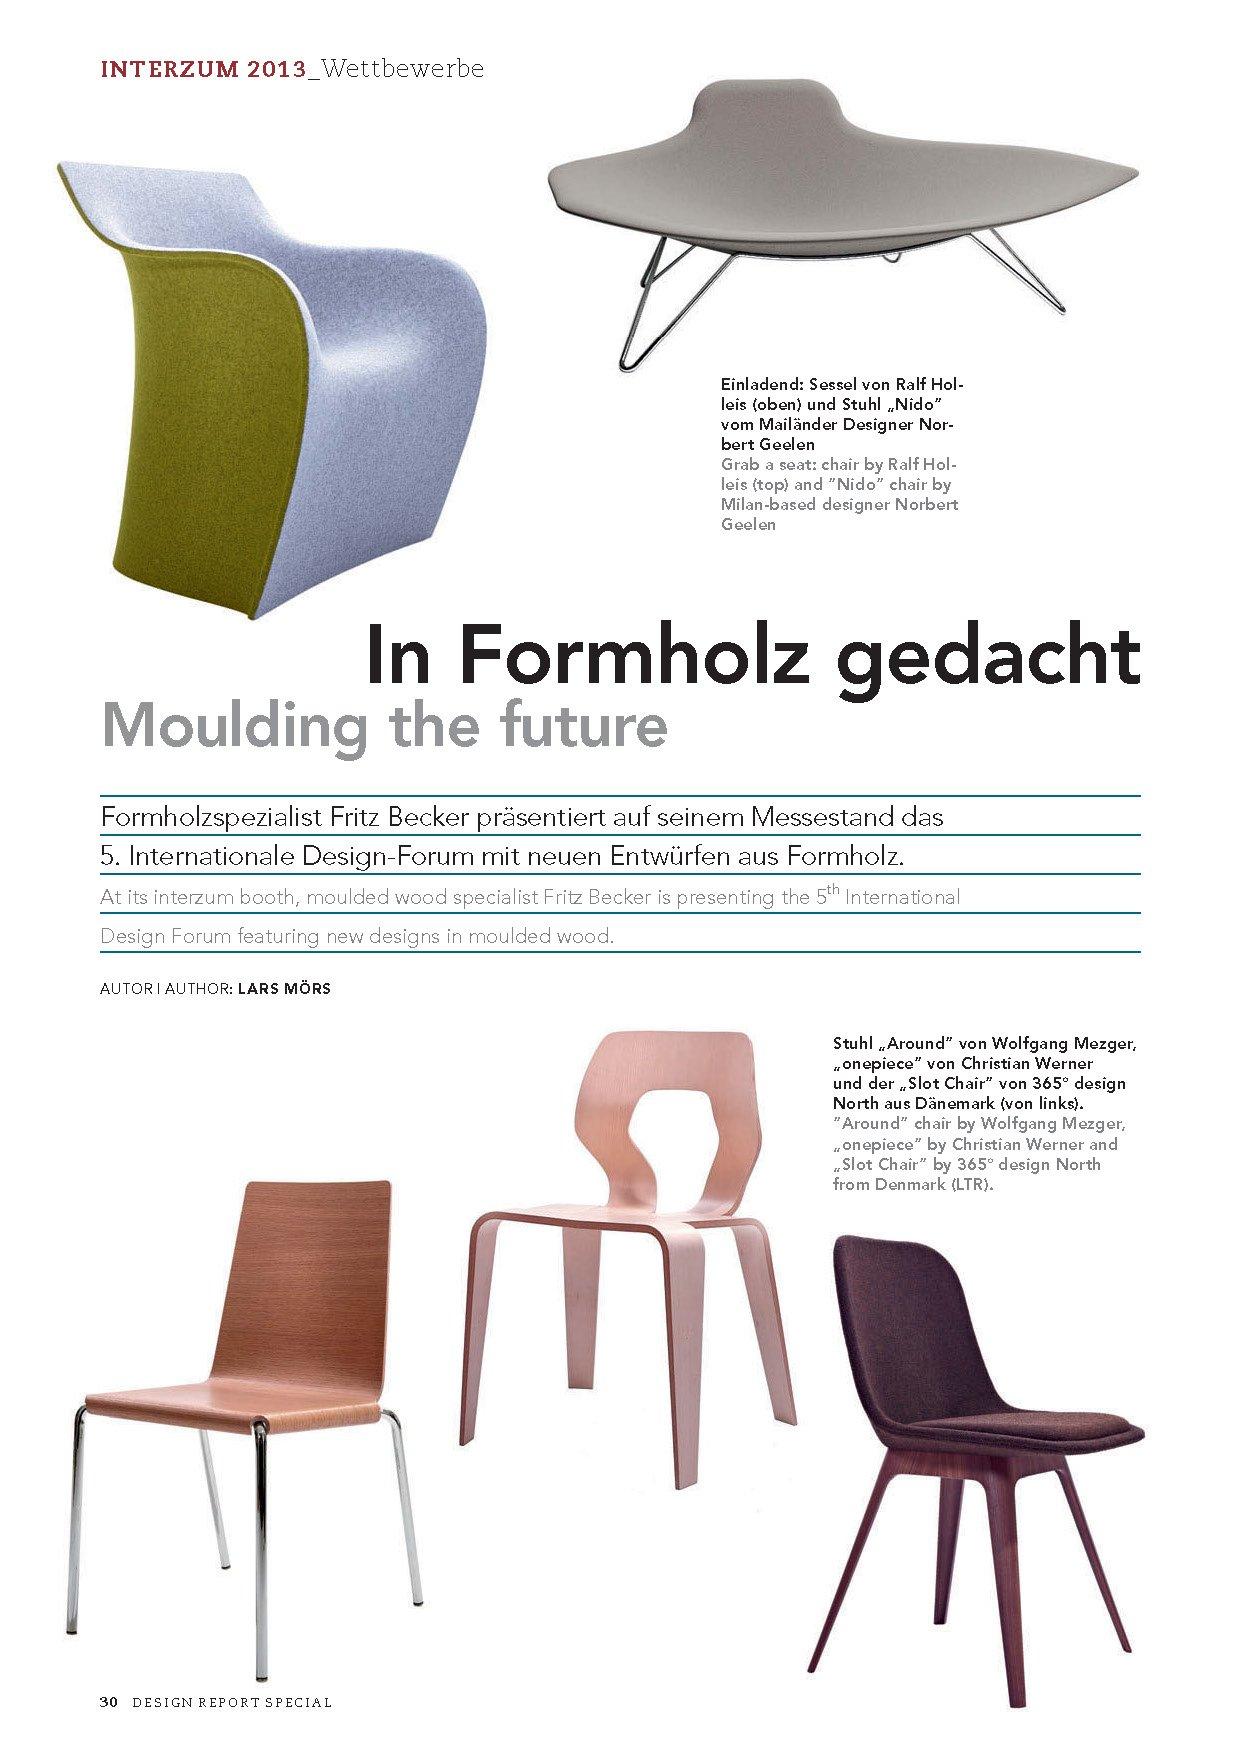 https://farconsulting.de/wp-content/uploads/2013/05/designreport_interzum2013_Seite_30.jpg